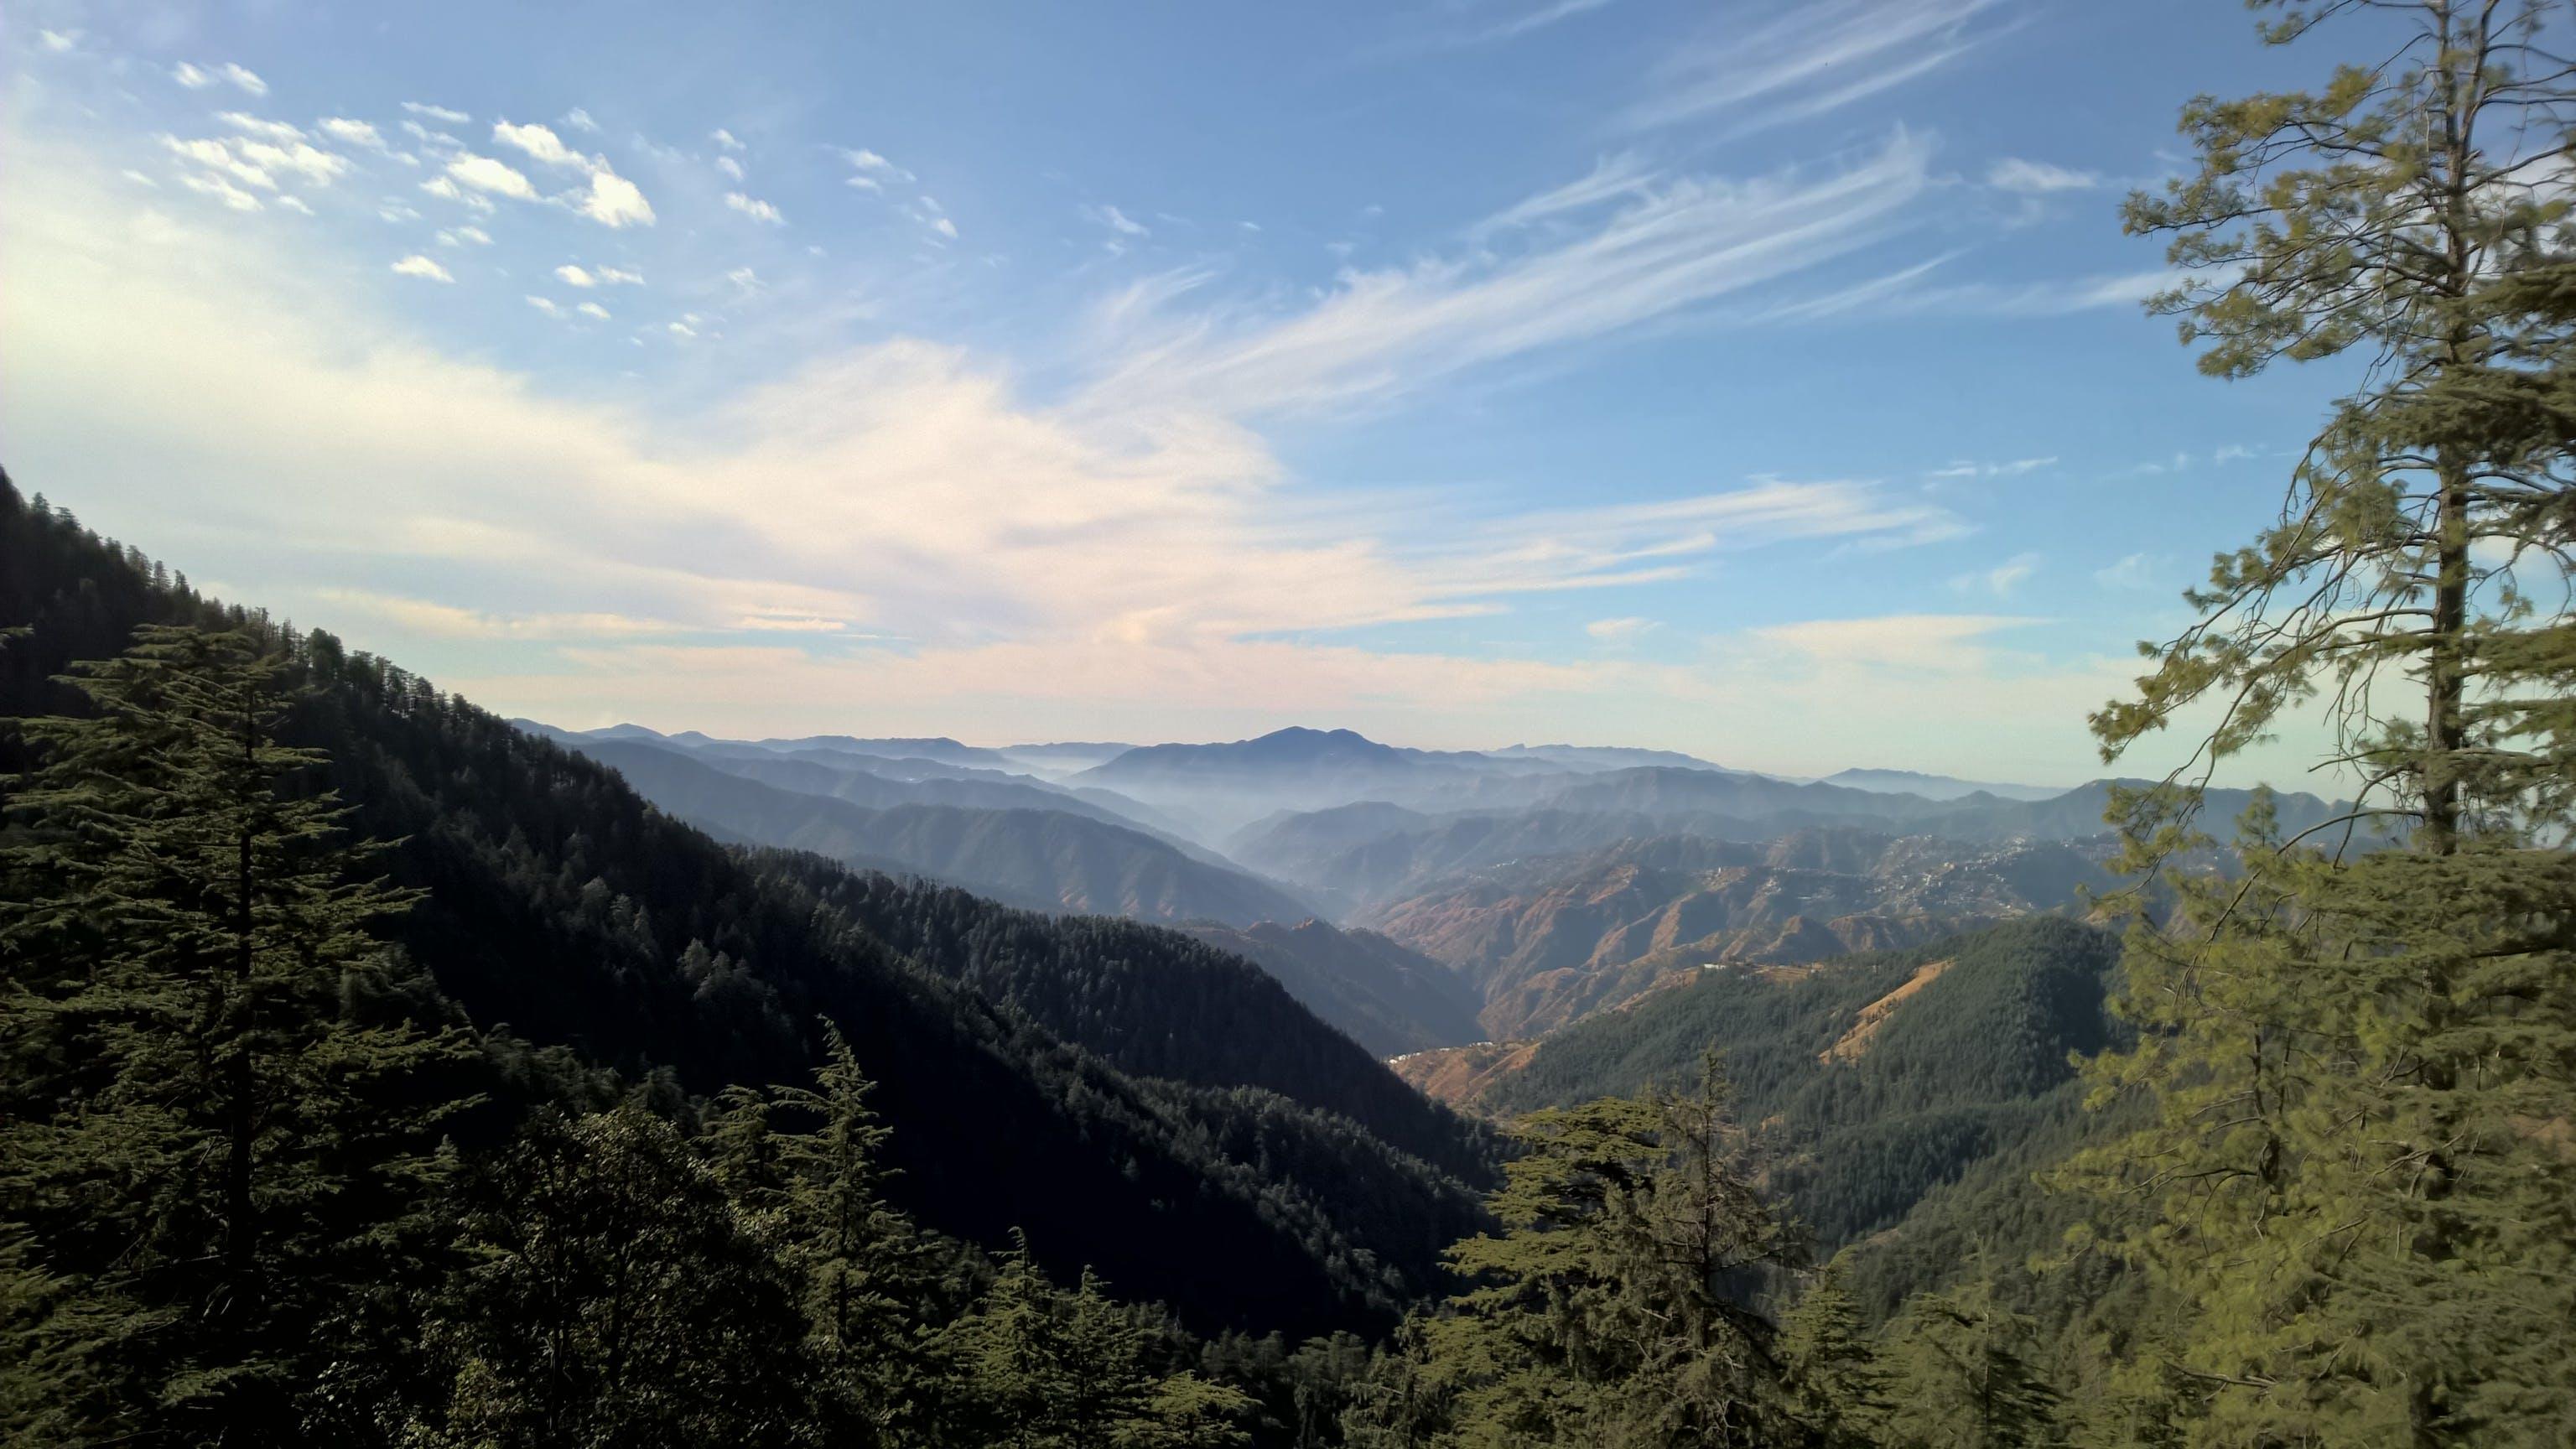 Bird's-eye View of Mountain Under Cloudy Sky